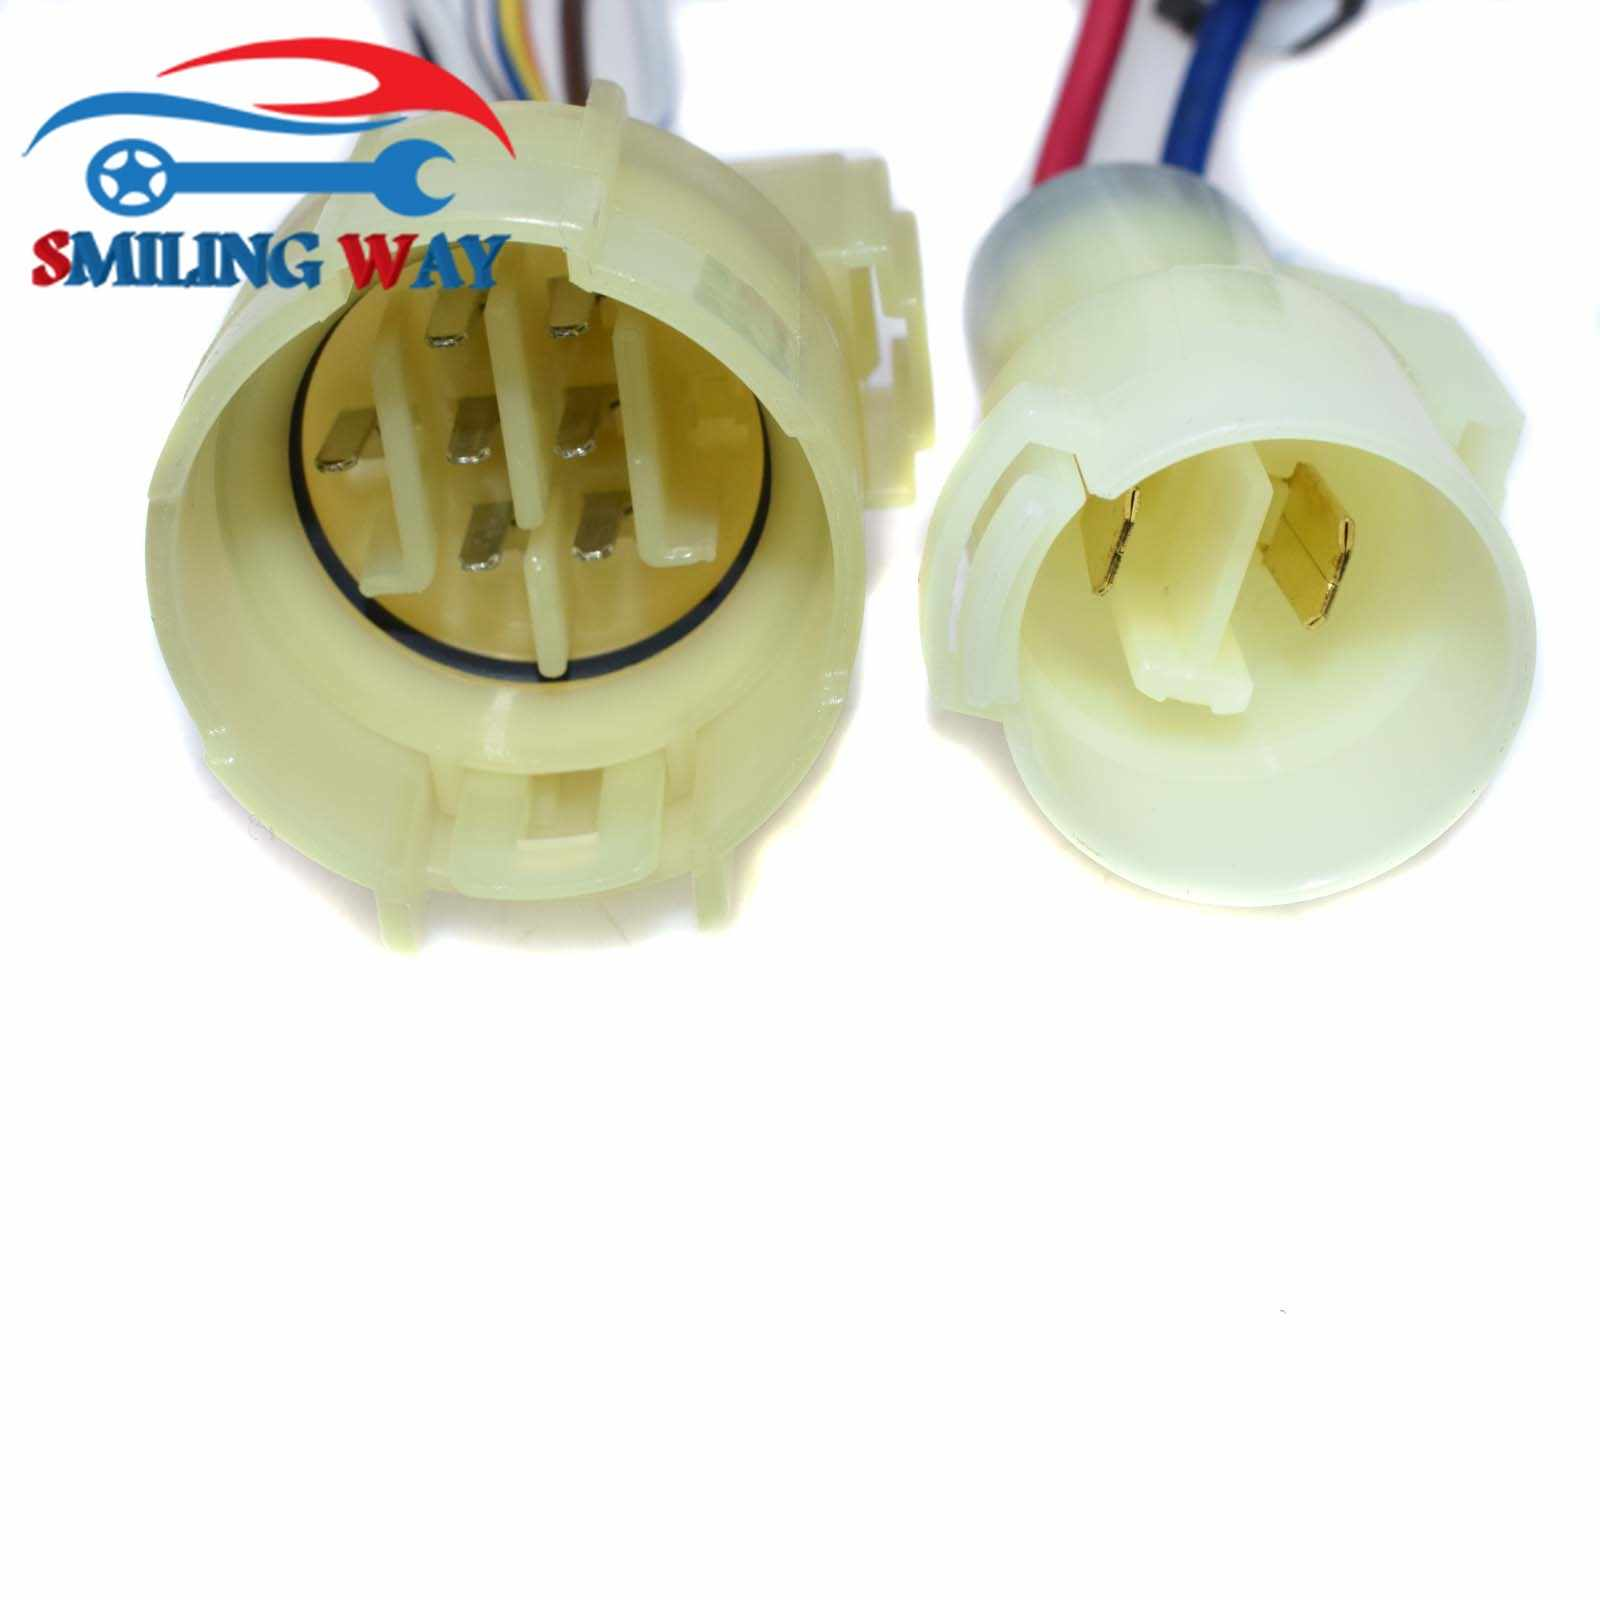 [DIAGRAM_38YU]  OBD0 to OBD1 ECU Distributor Adaptor Connector Wire Harness Cable For Honda  CRX Civic Prelude Acura Integra B17 B16 B18 B20| | - AliExpress | B17 Wiring Harness |  | AliExpress